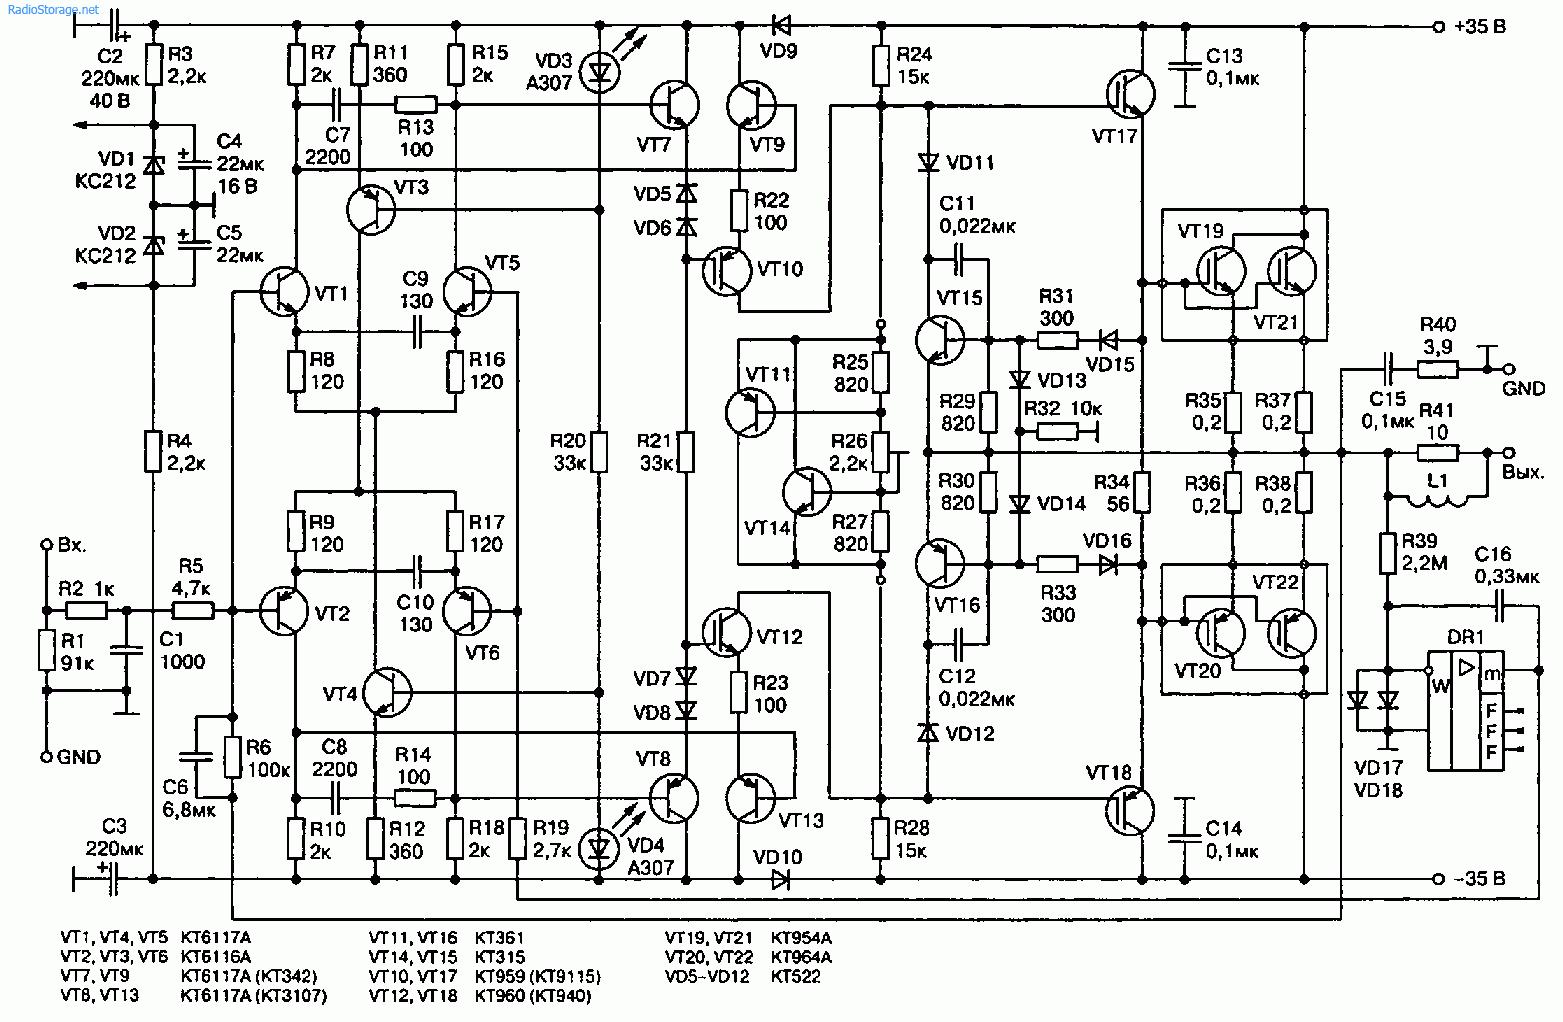 УМЗЧ с плавной амплитудной характеристикой на БСИТ транзисторах